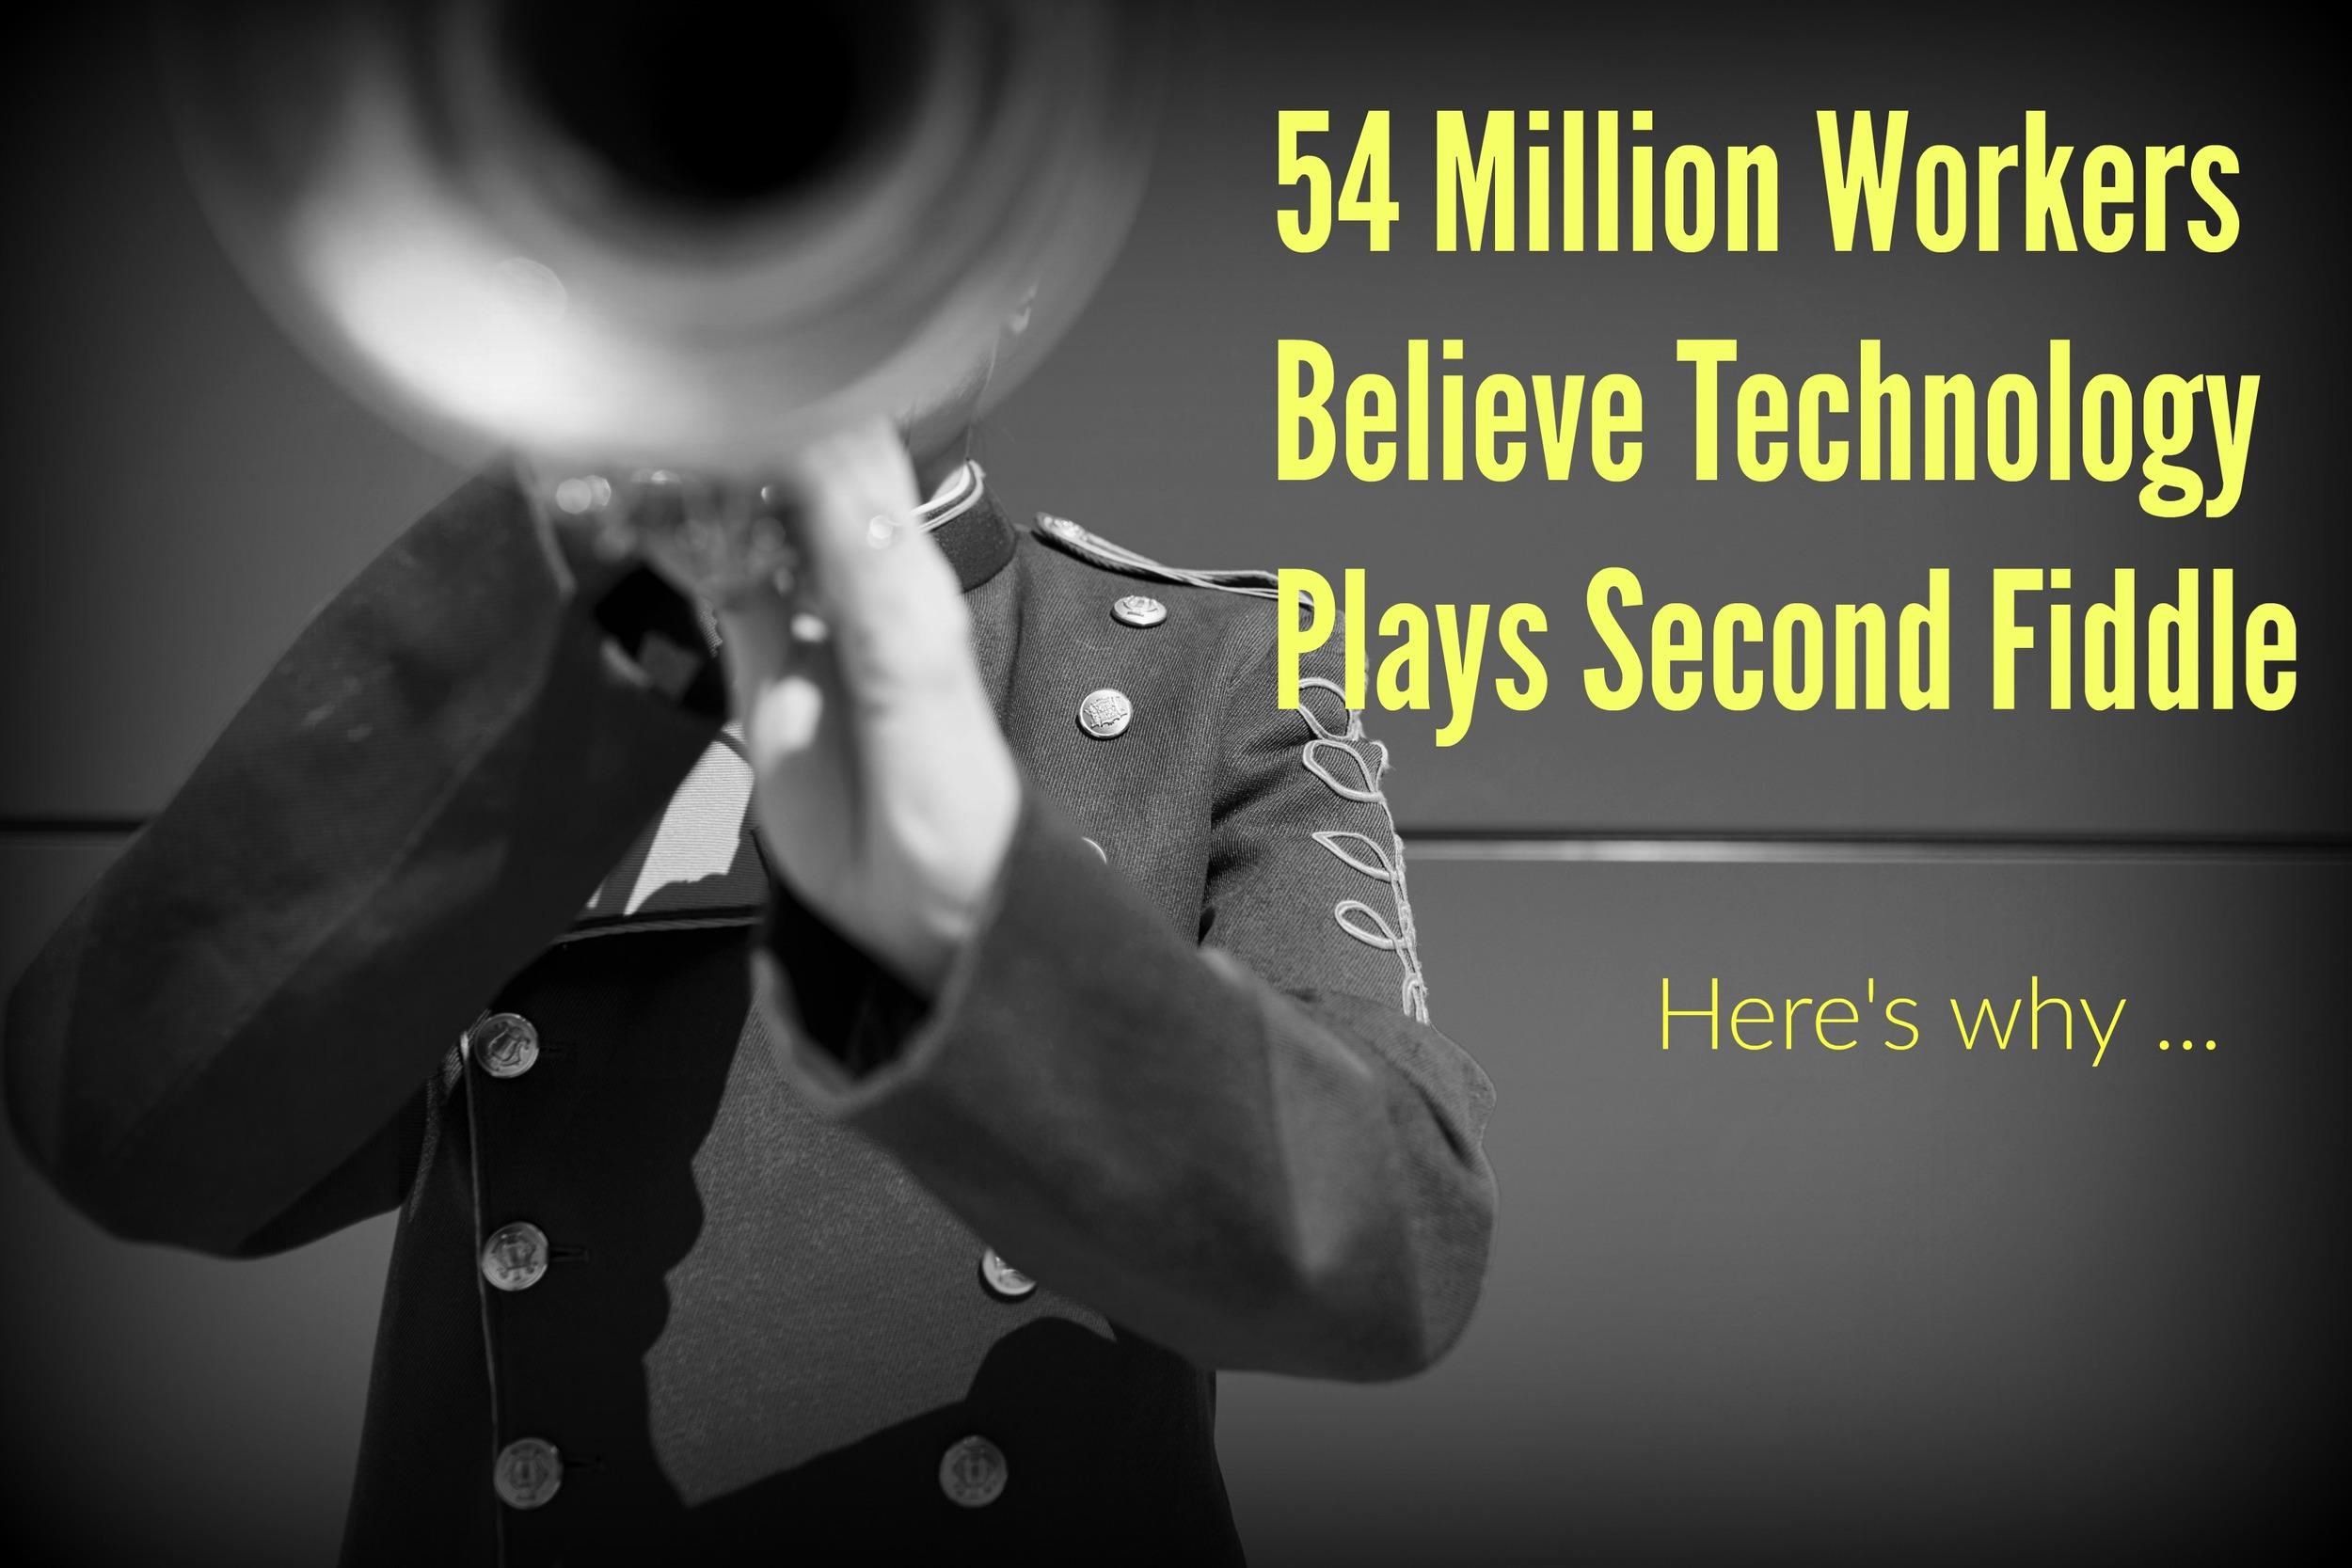 54-Million-Workers-Believe-Tech-Plays-Second-Fiddle-.jpg